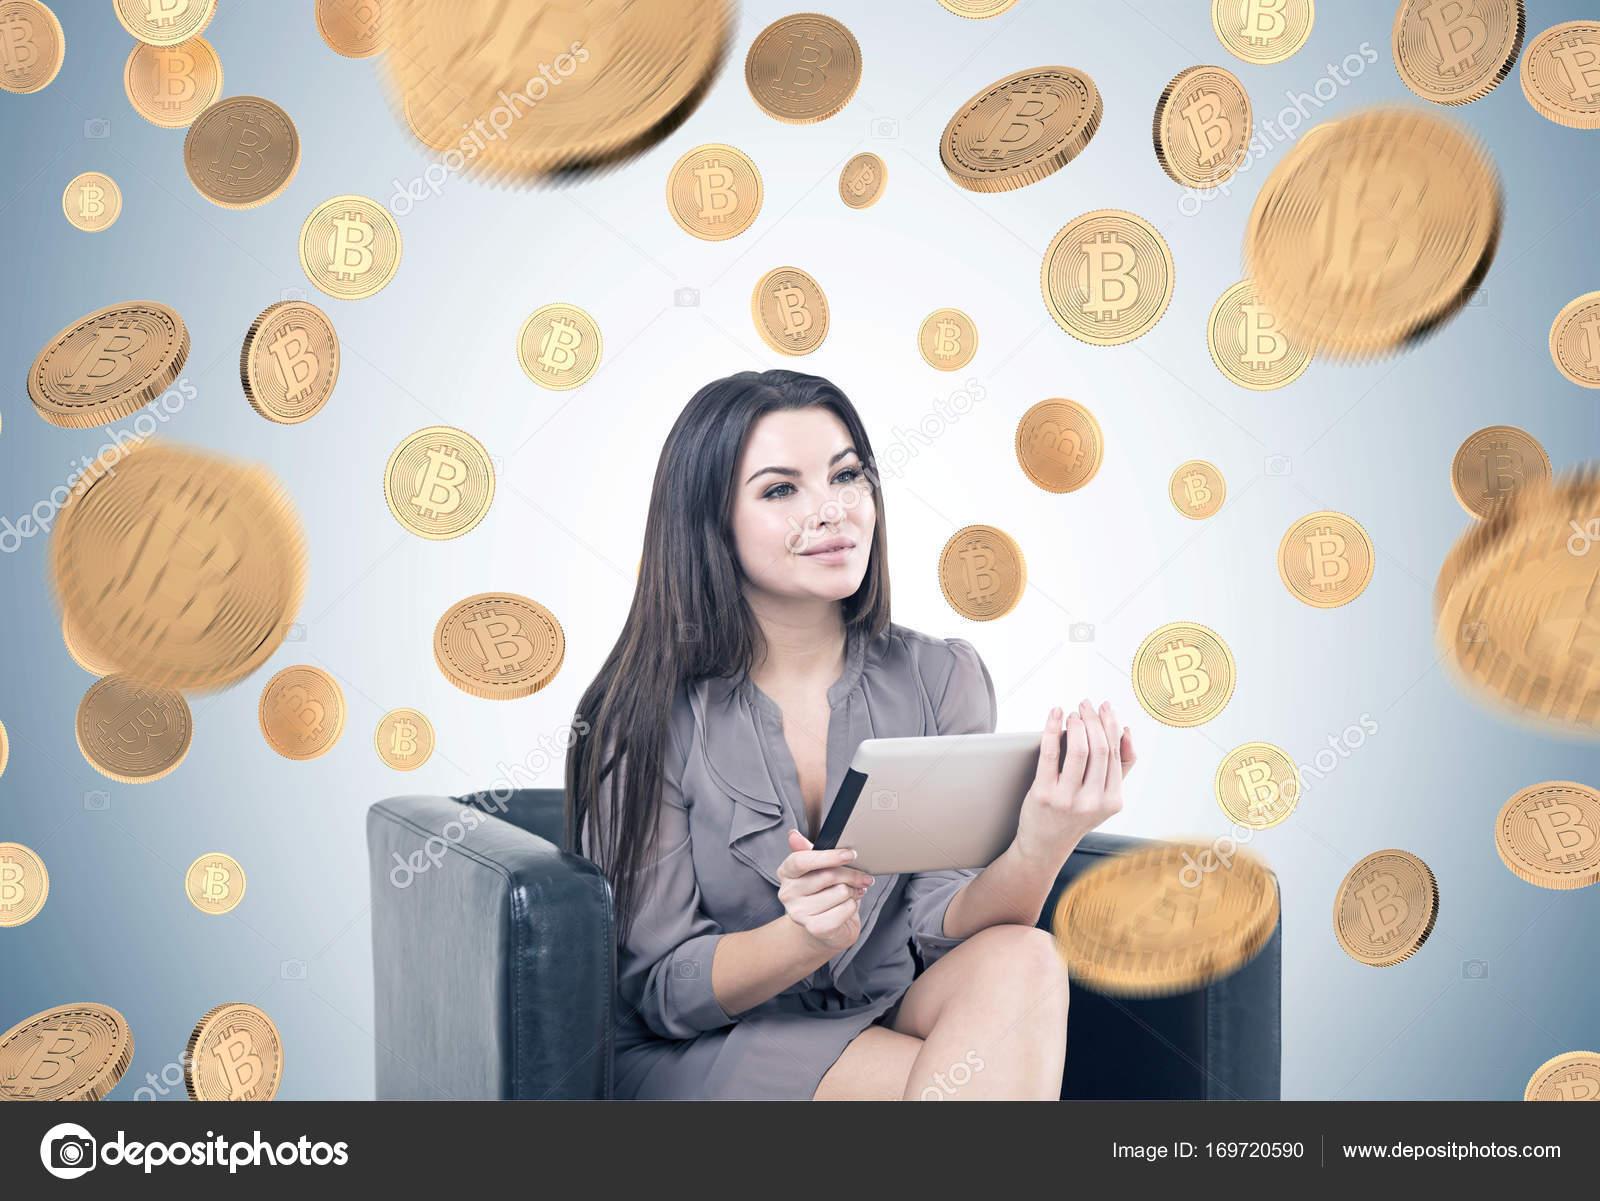 Alegre mulher na poltrona, um tablet, bitcoins — Fotografia de Stock